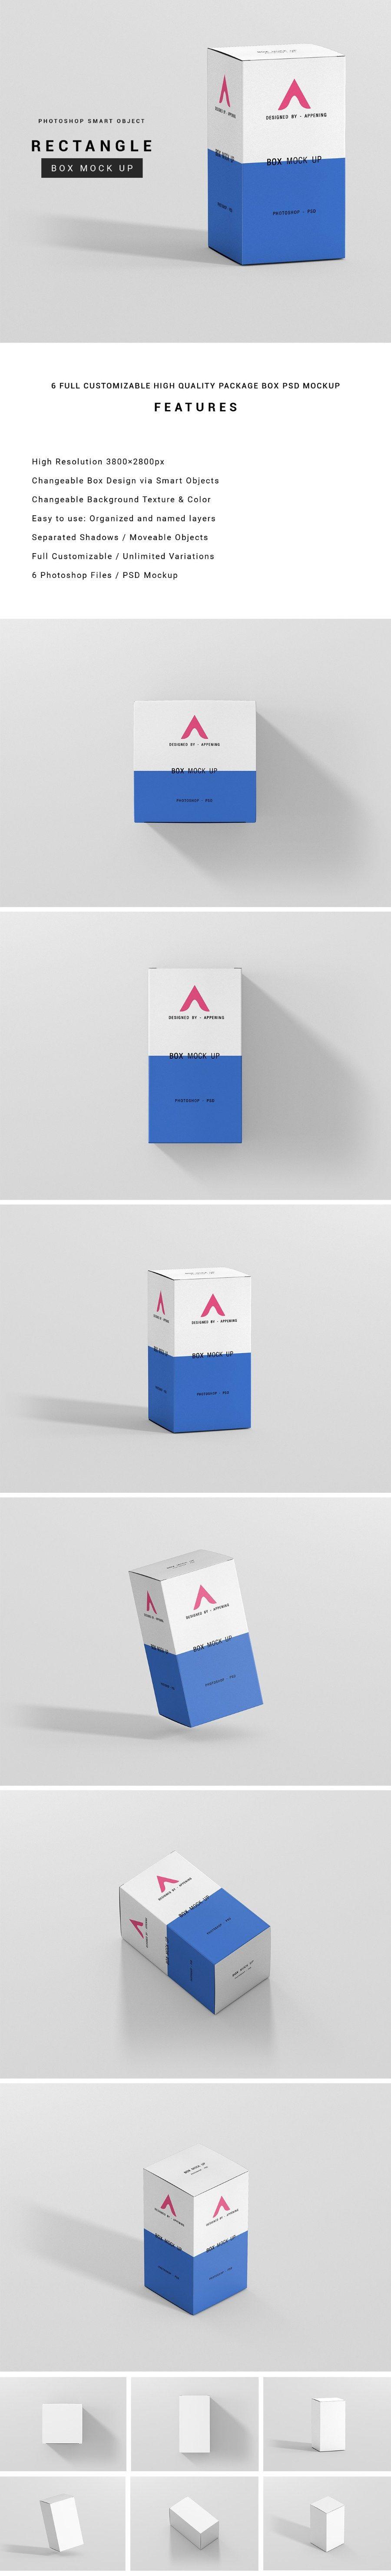 Download Free Rectangle Box Mockup | Free packaging mockup, Box ...